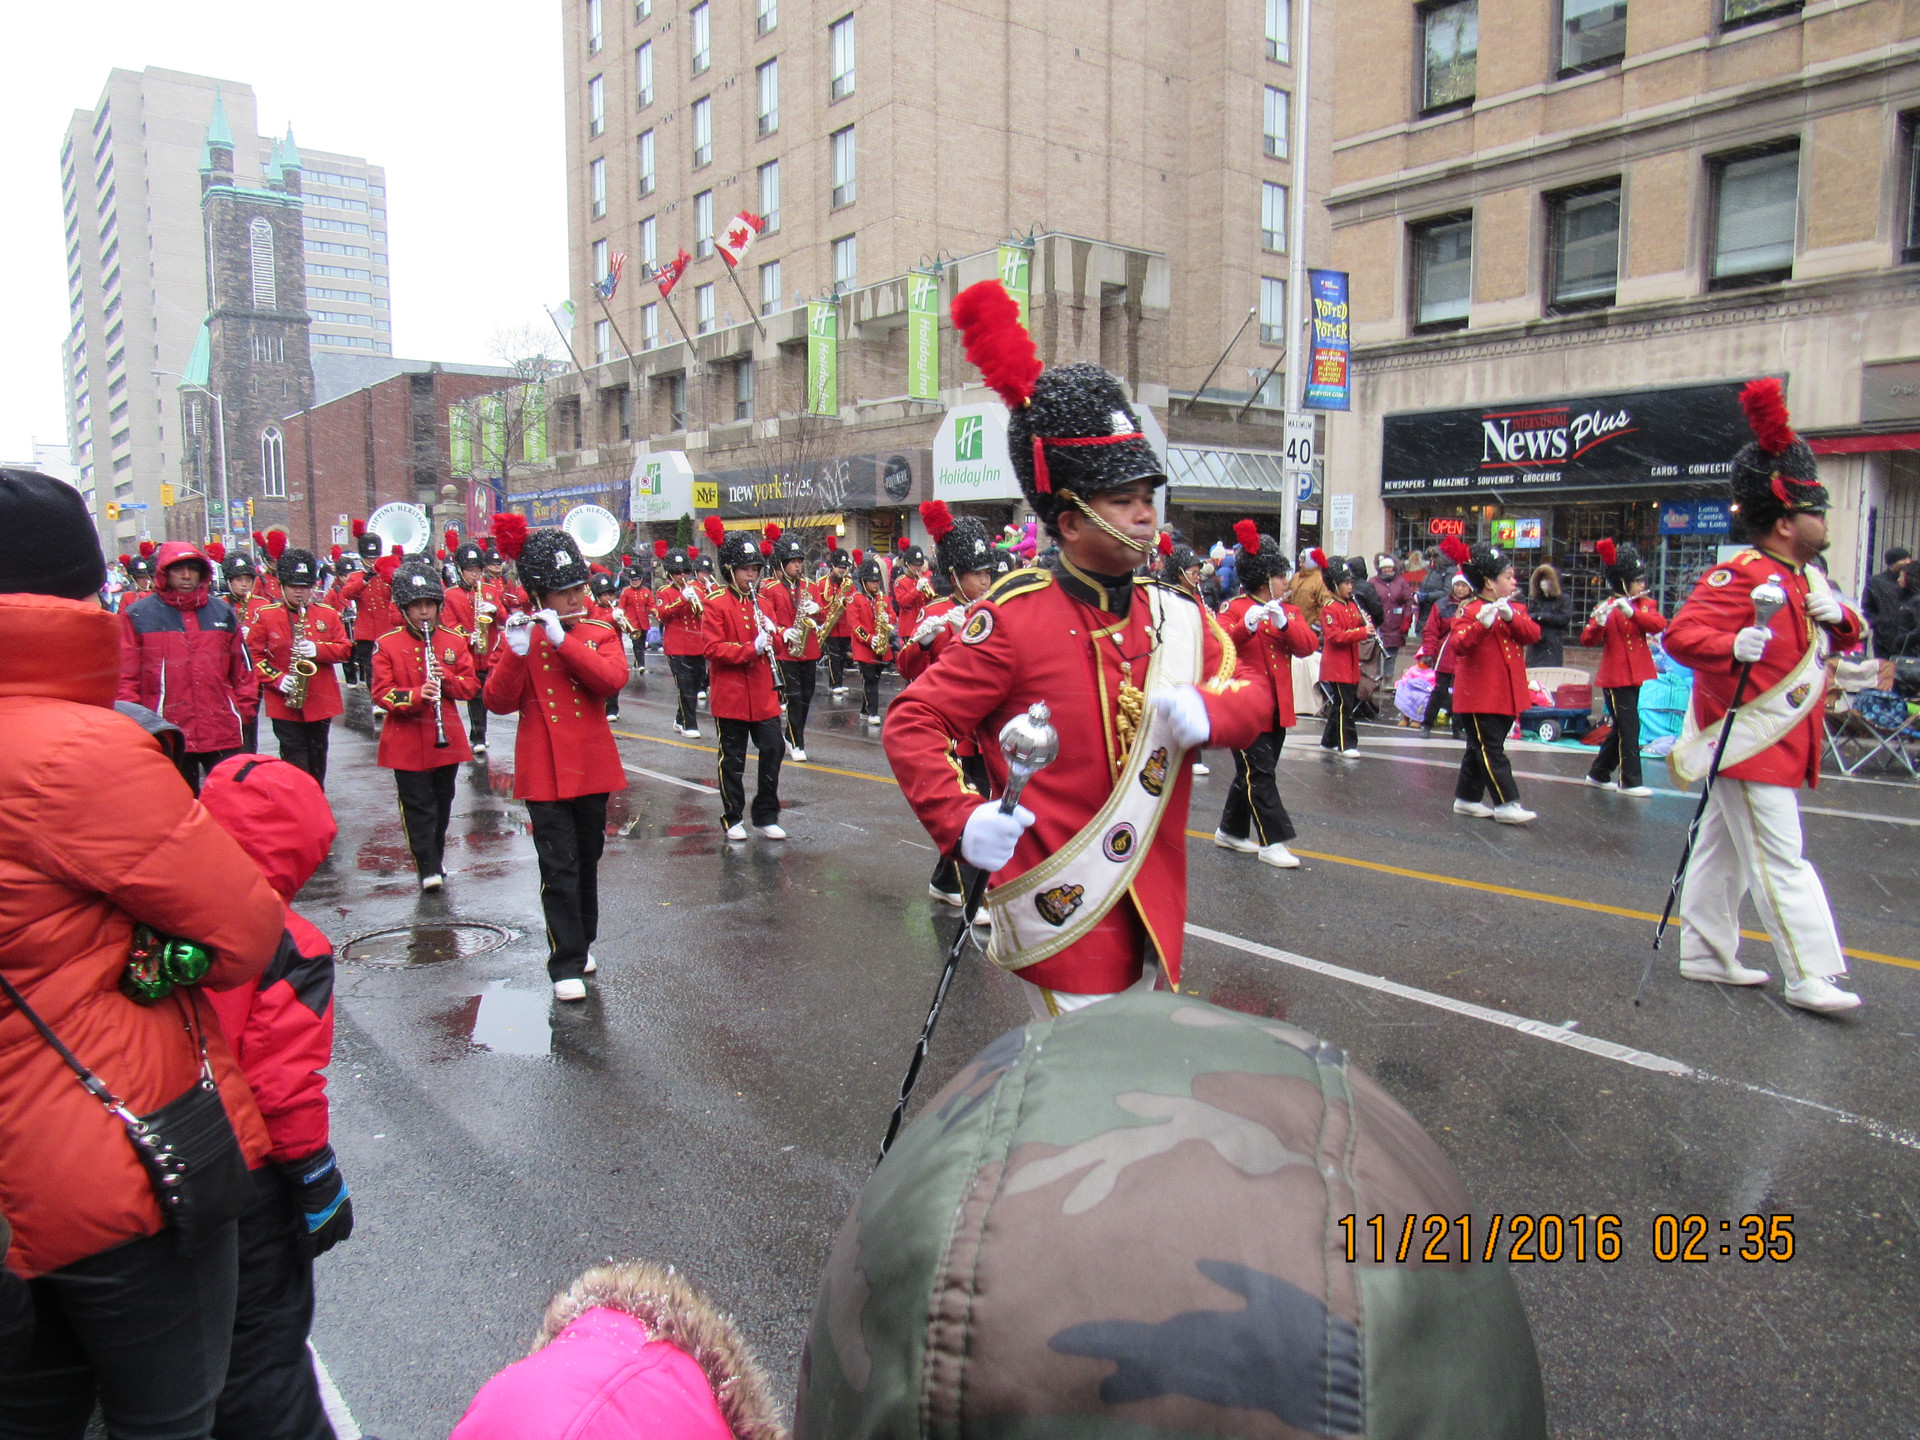 Marching in Toronto Santa Claus Parade